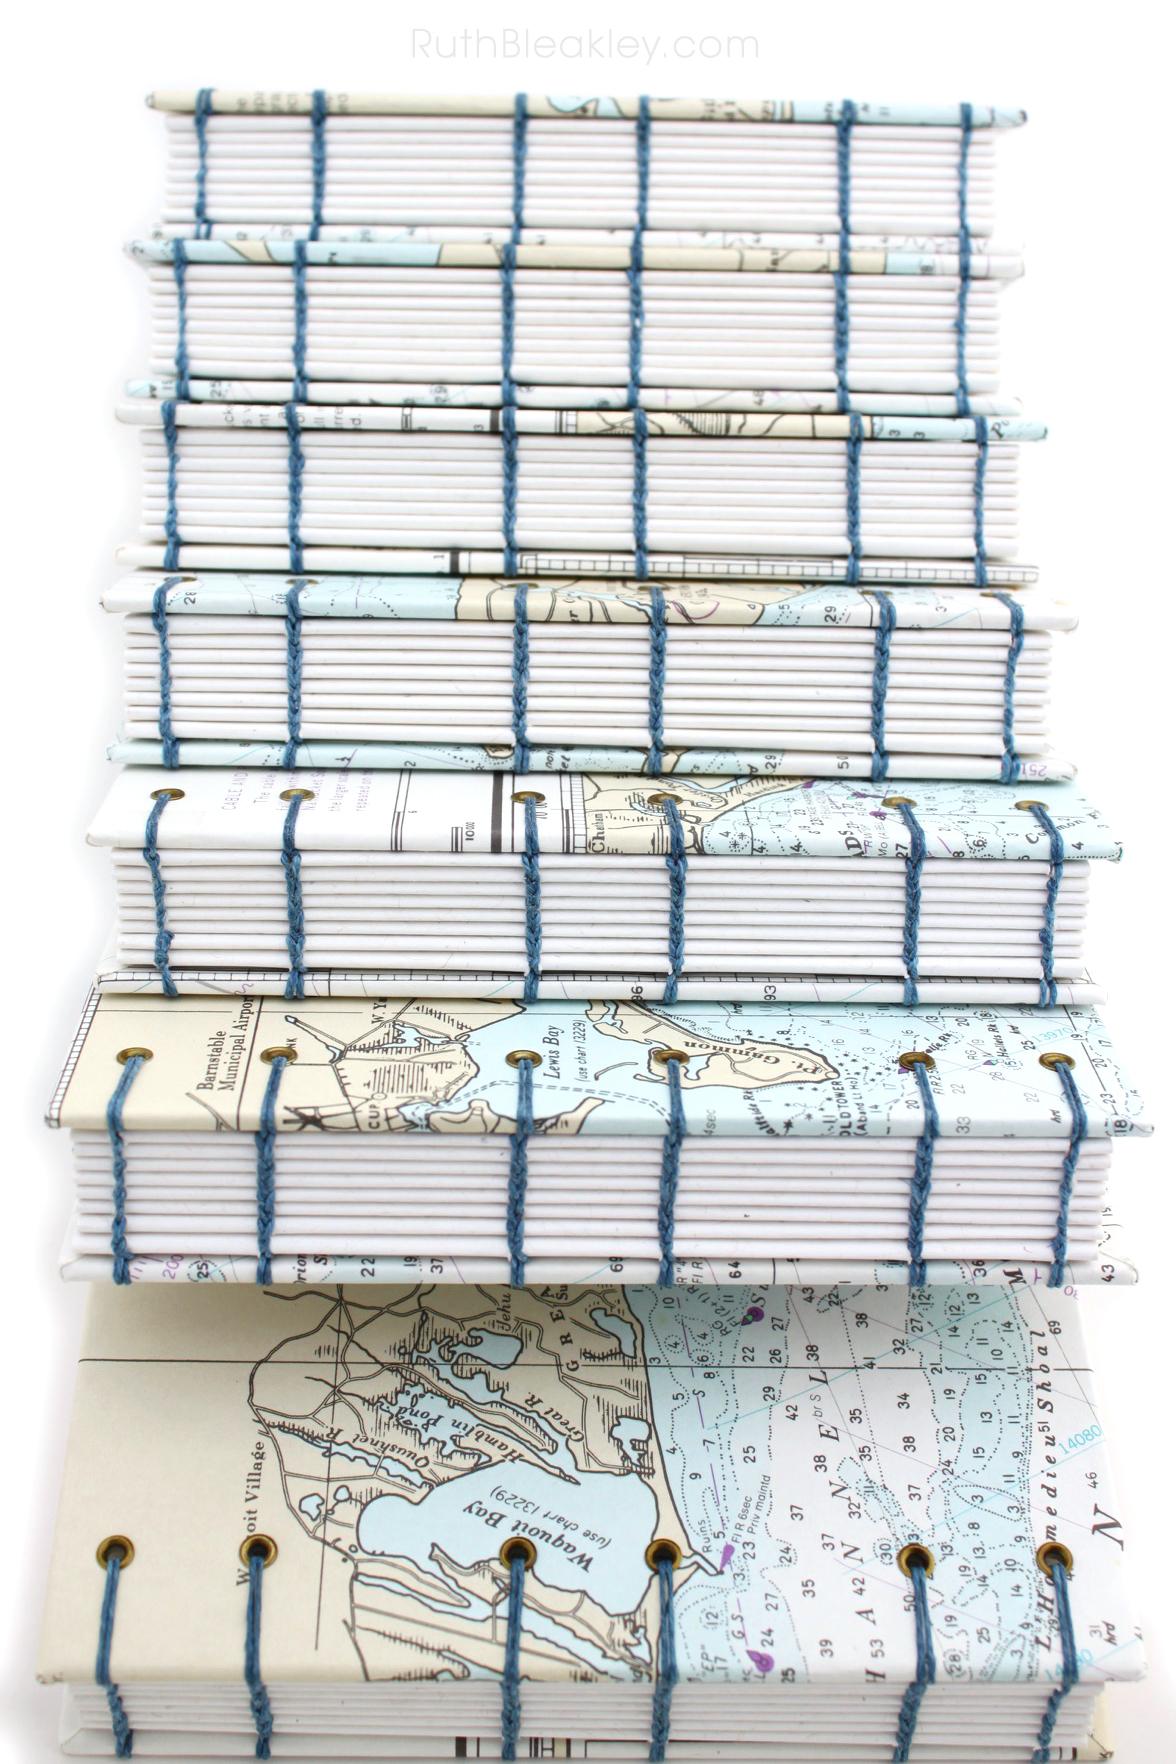 Cape Cod Nautical Chart Journals handmade by Ruth Bleakley - coptic journals